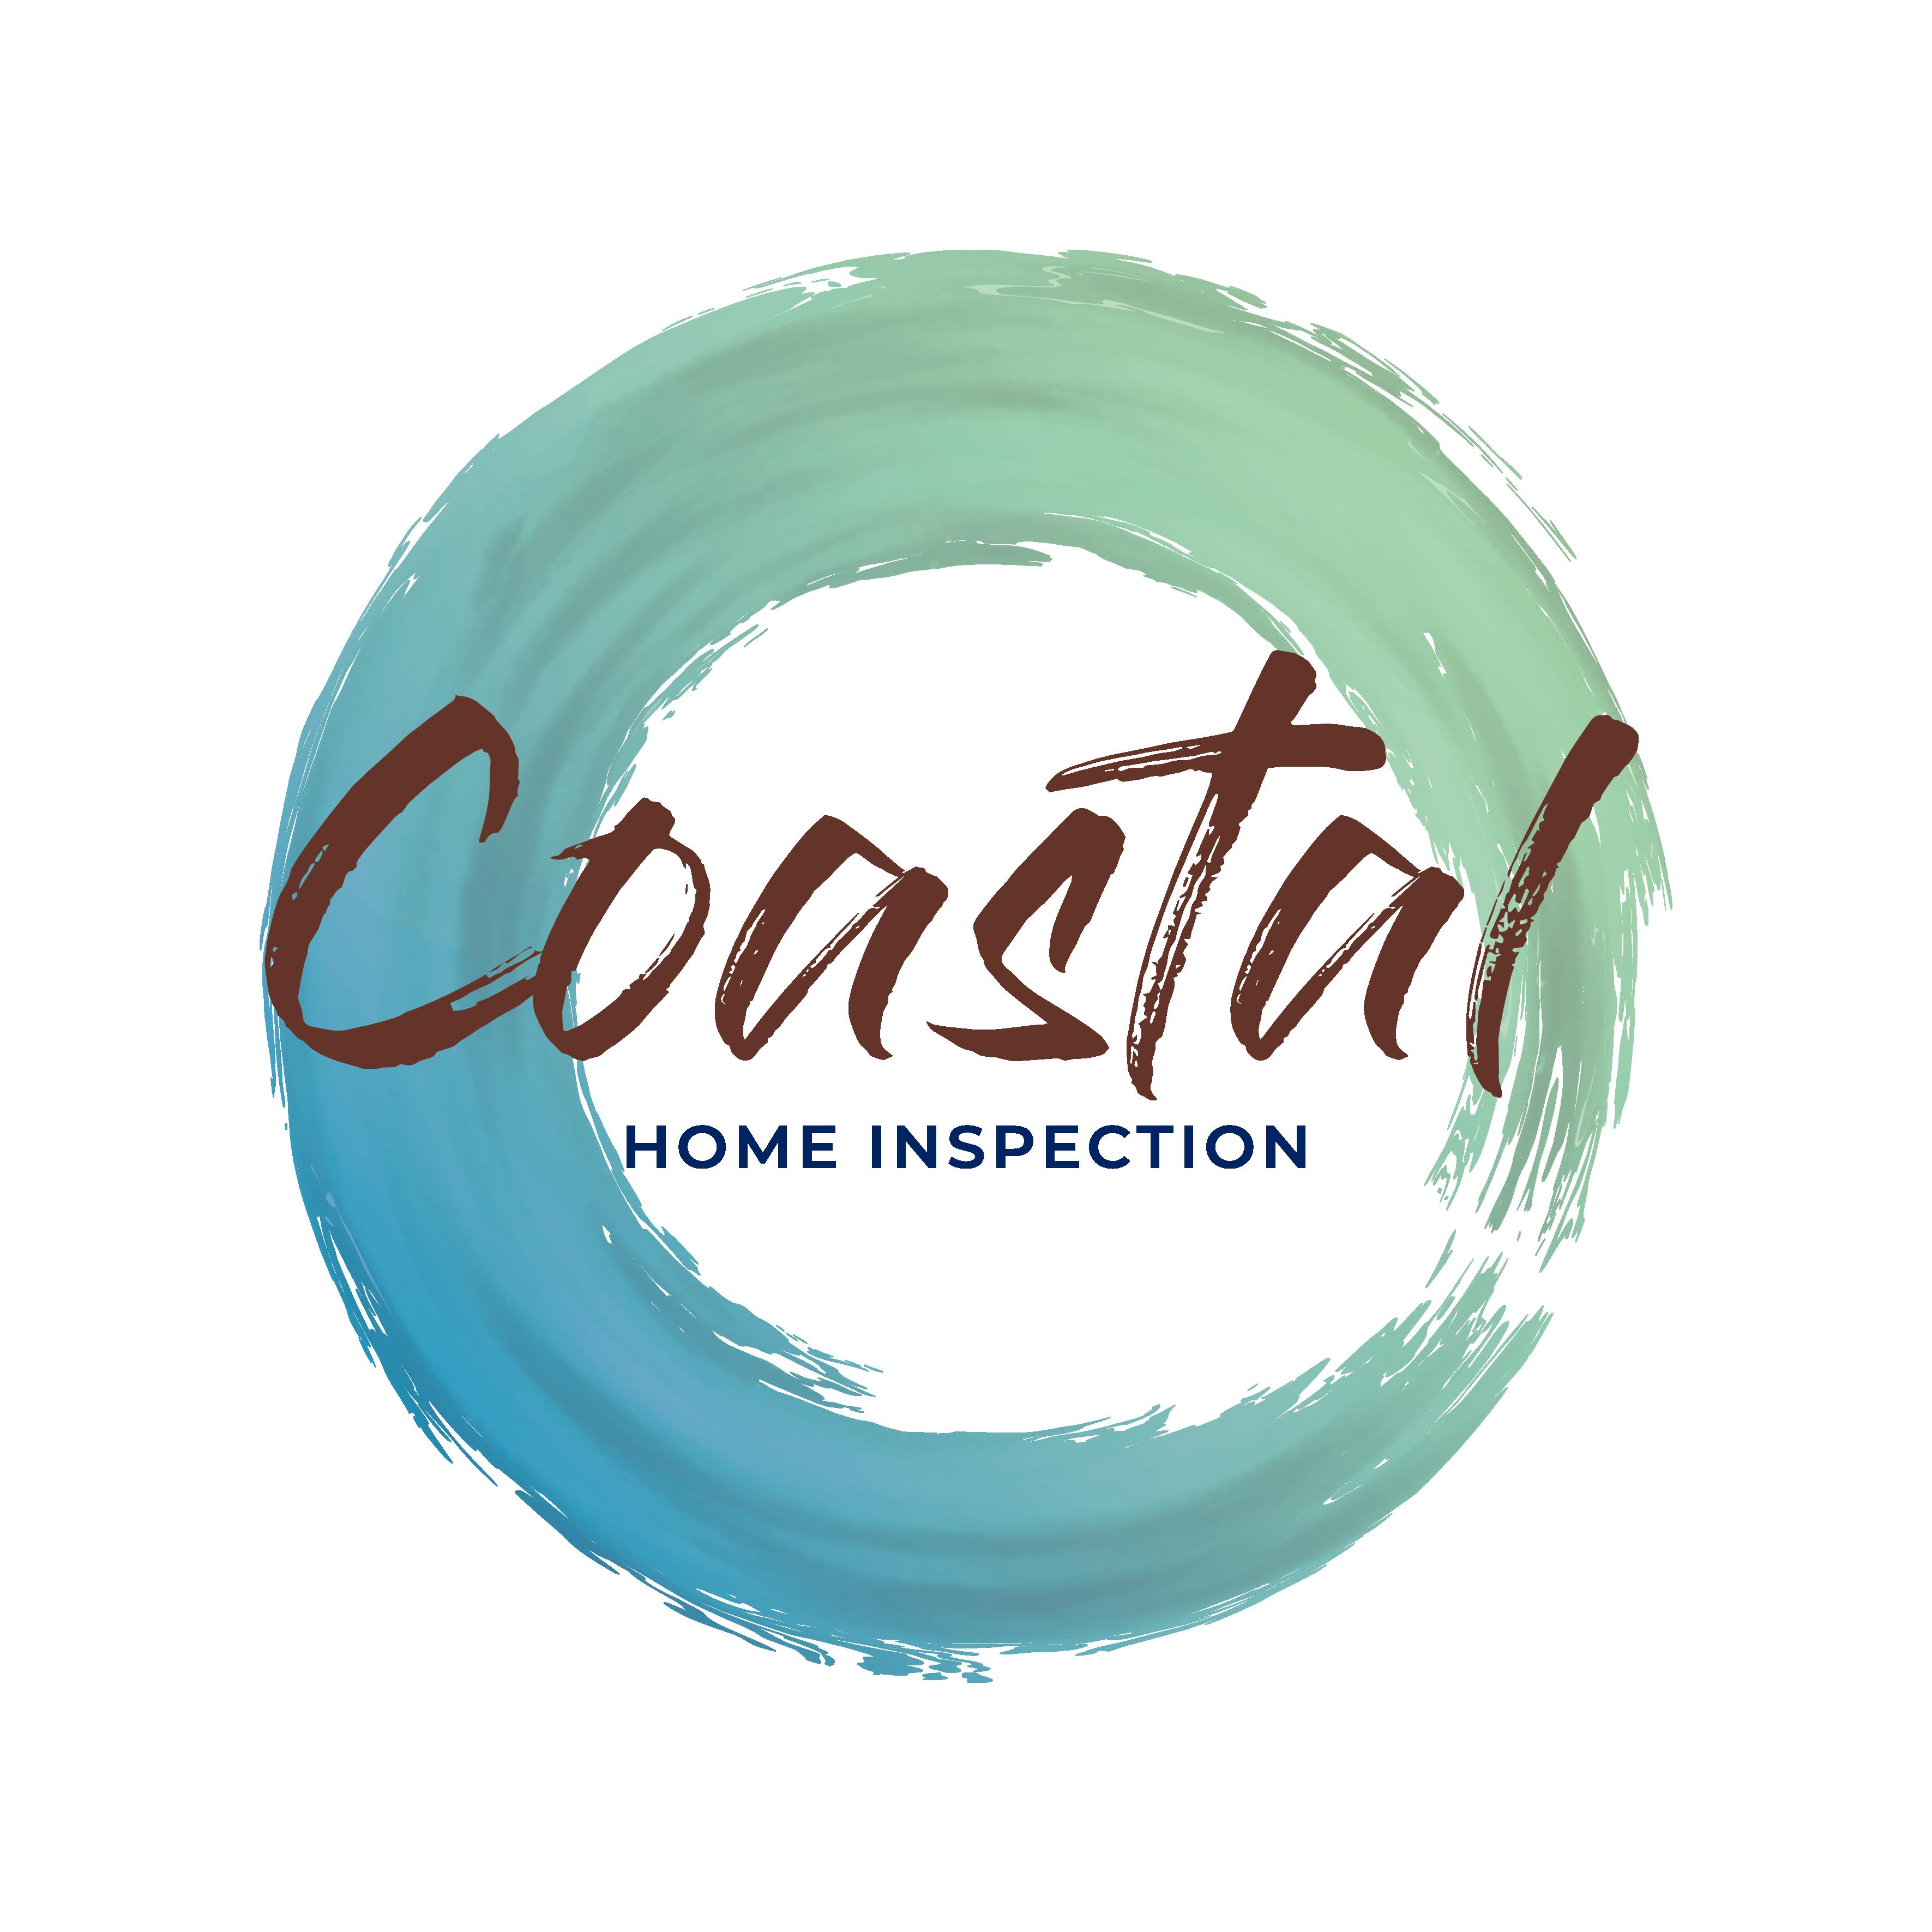 Coastal home inspection logo